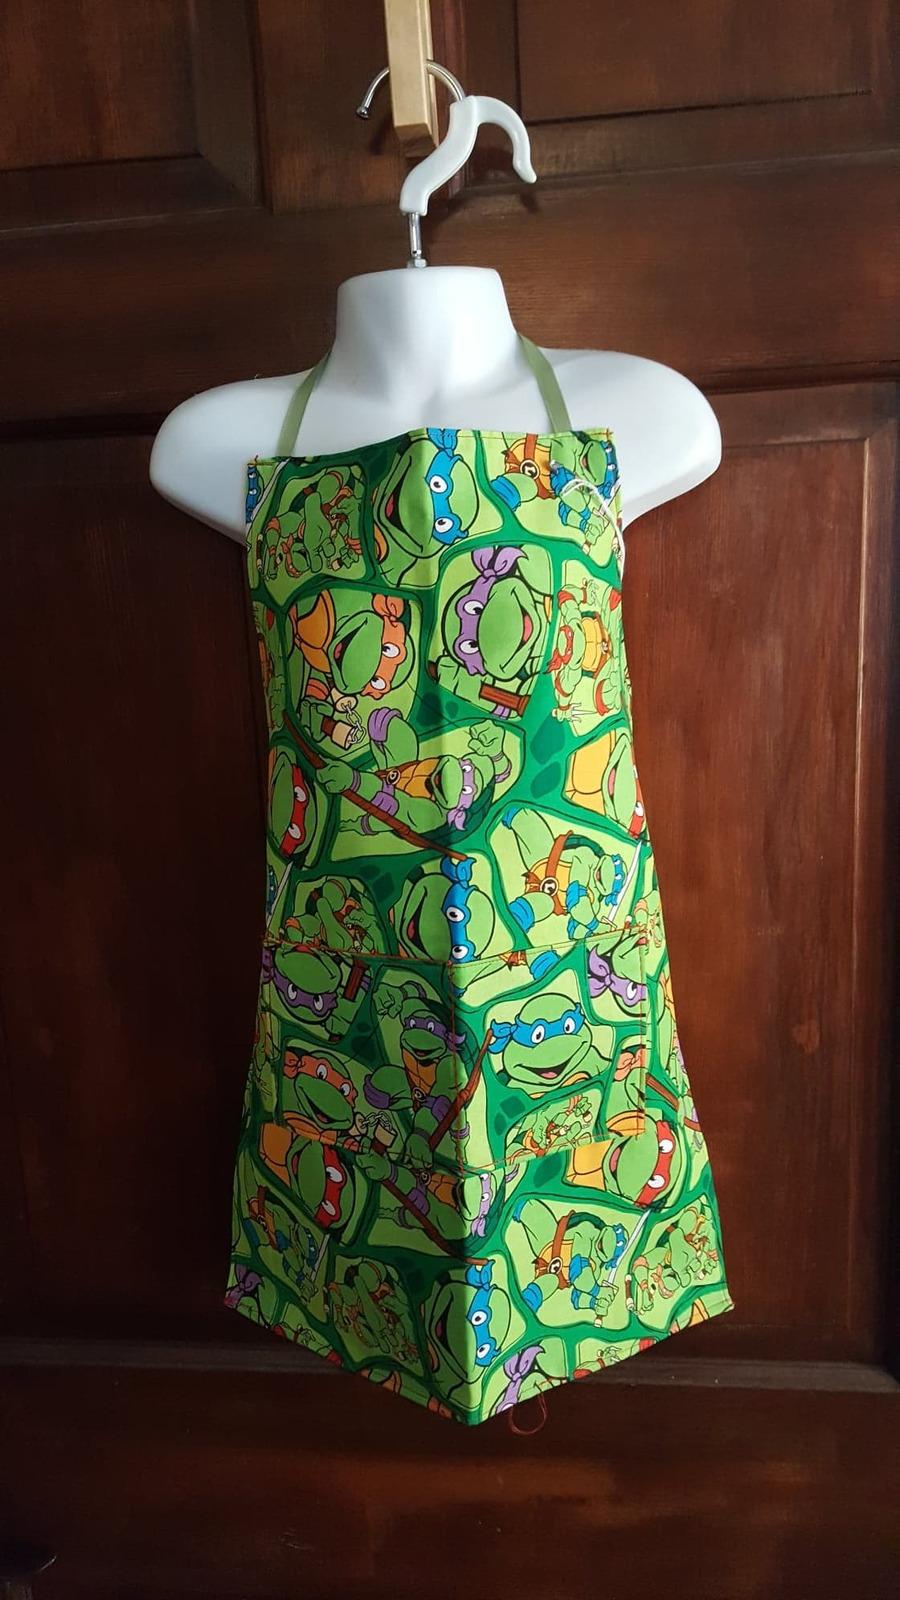 Child Apron Lined w/Pockets Cotton - Teenage Mutant Ninja Turtles! SM (2T/4T) - $12.99